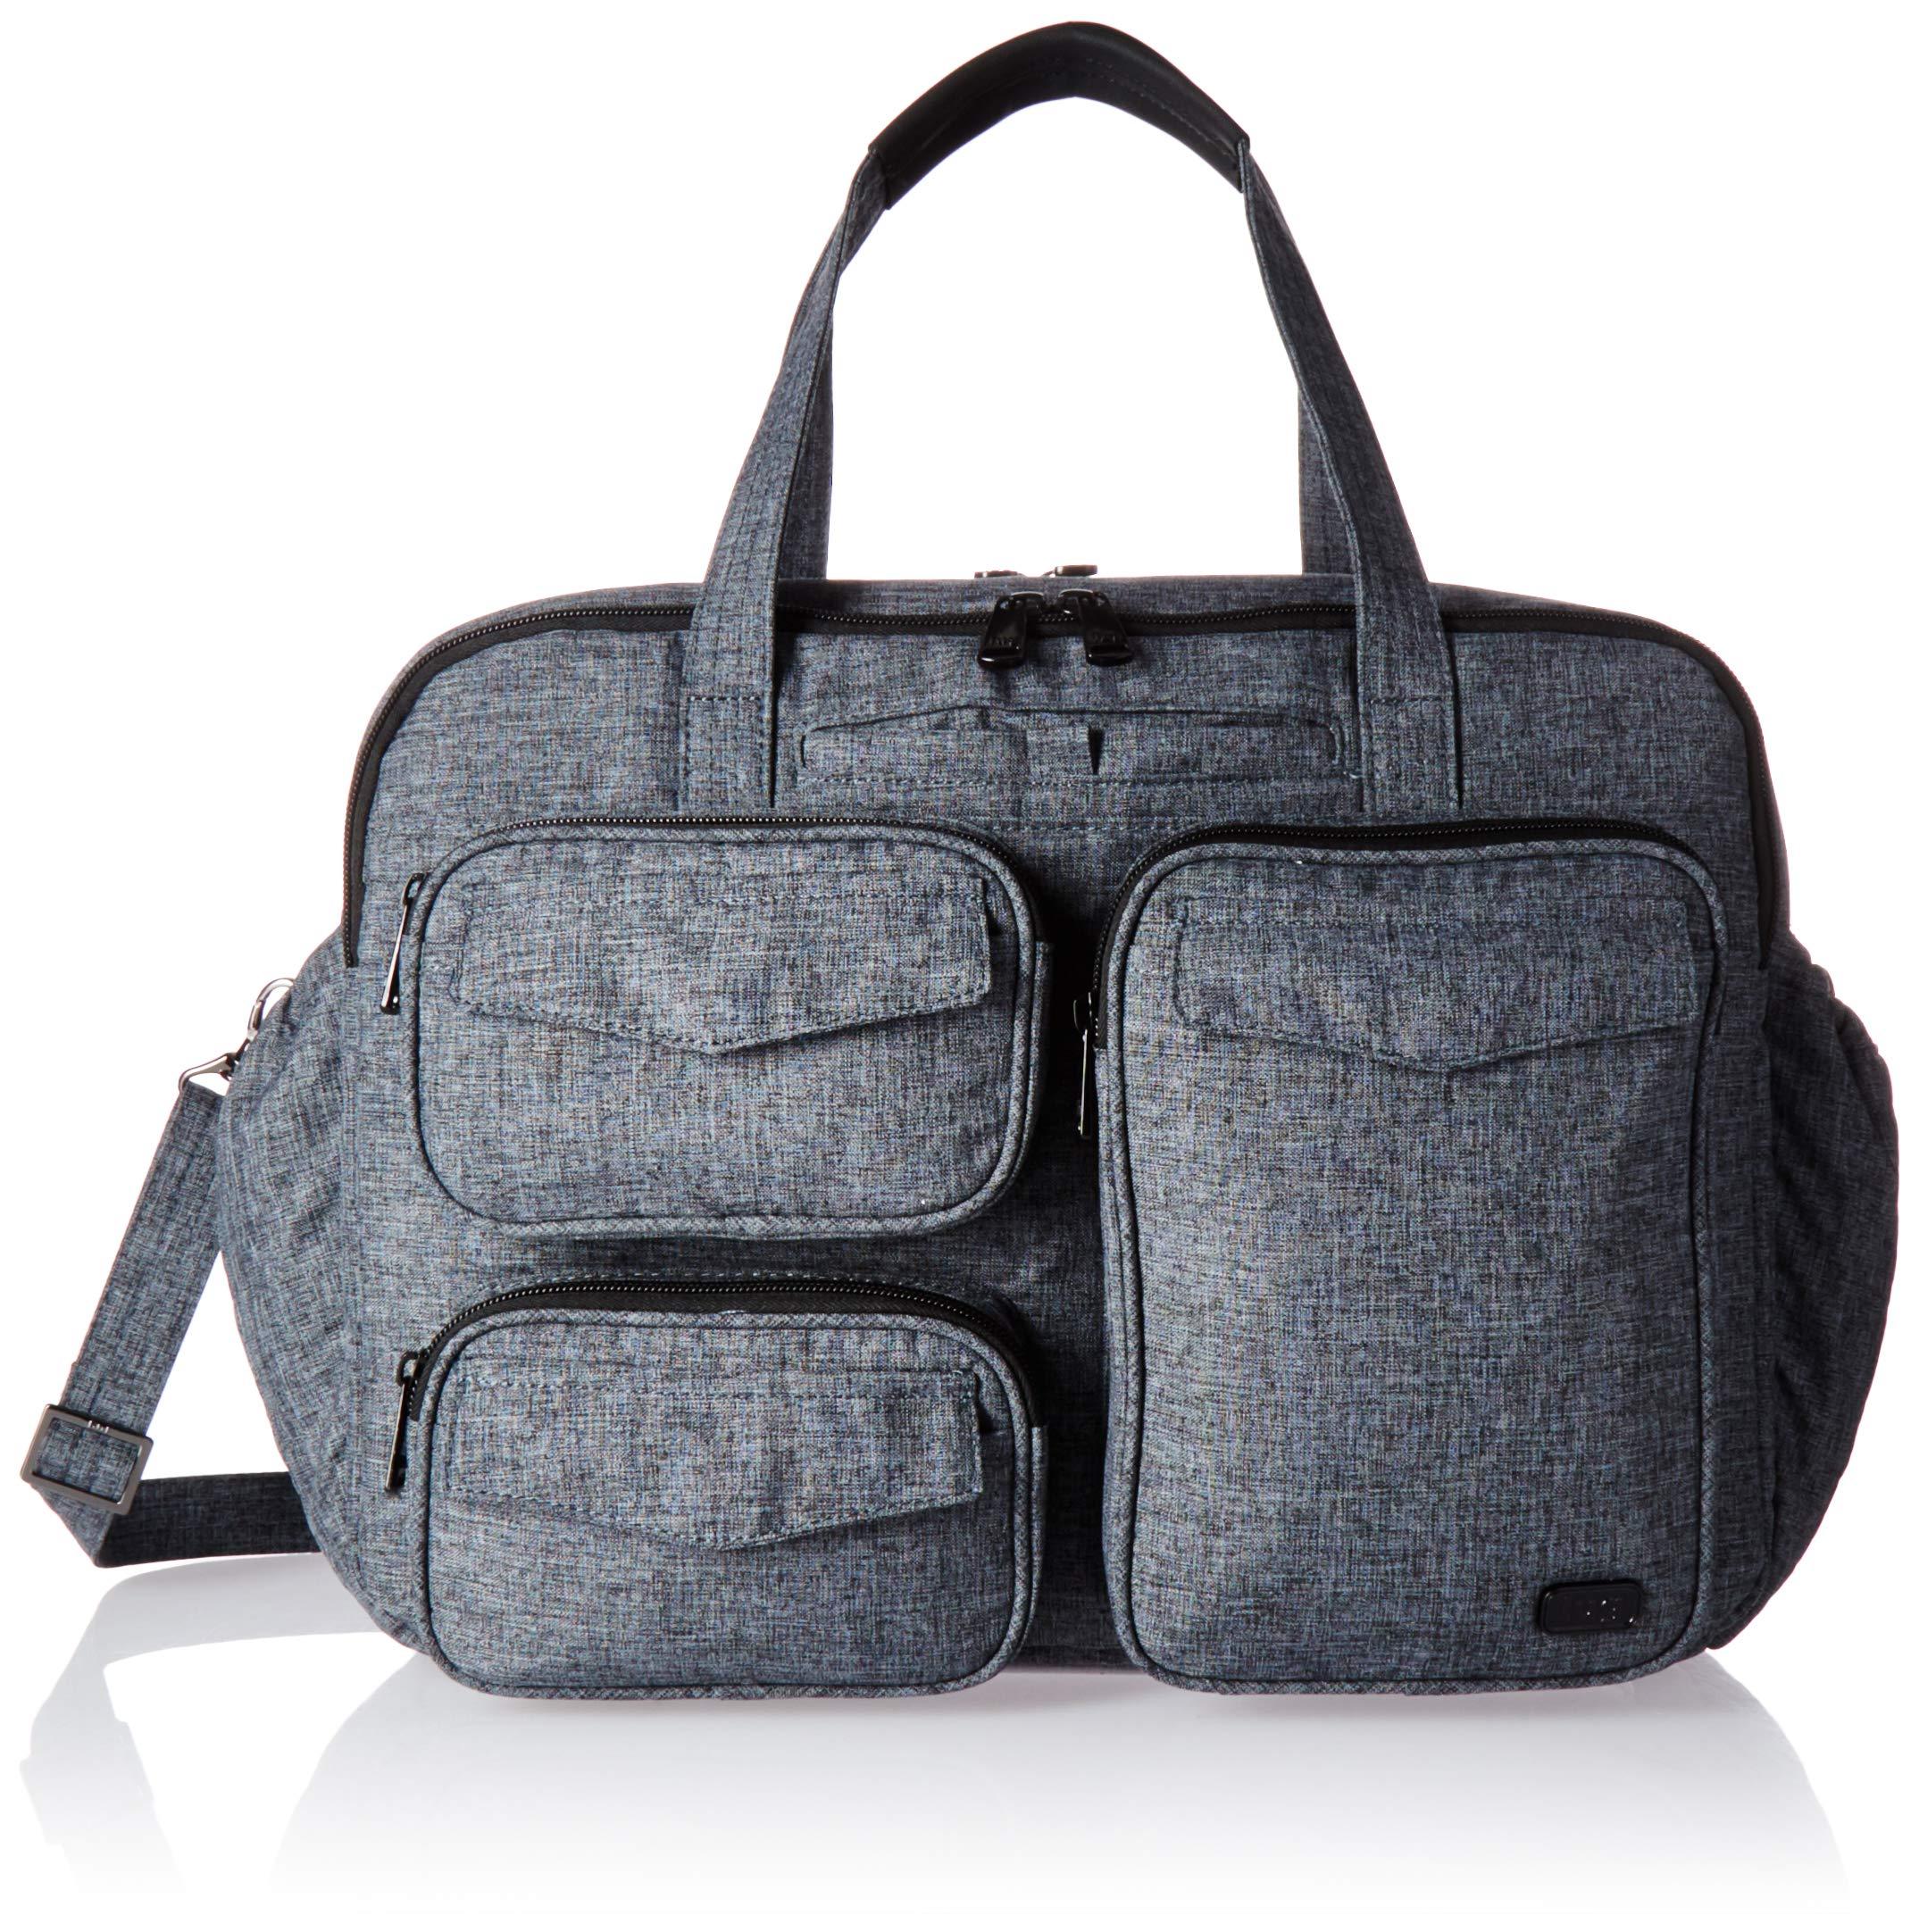 Lug Women's Puddle Jumper Duffel, Heather Grey Bag, One Size